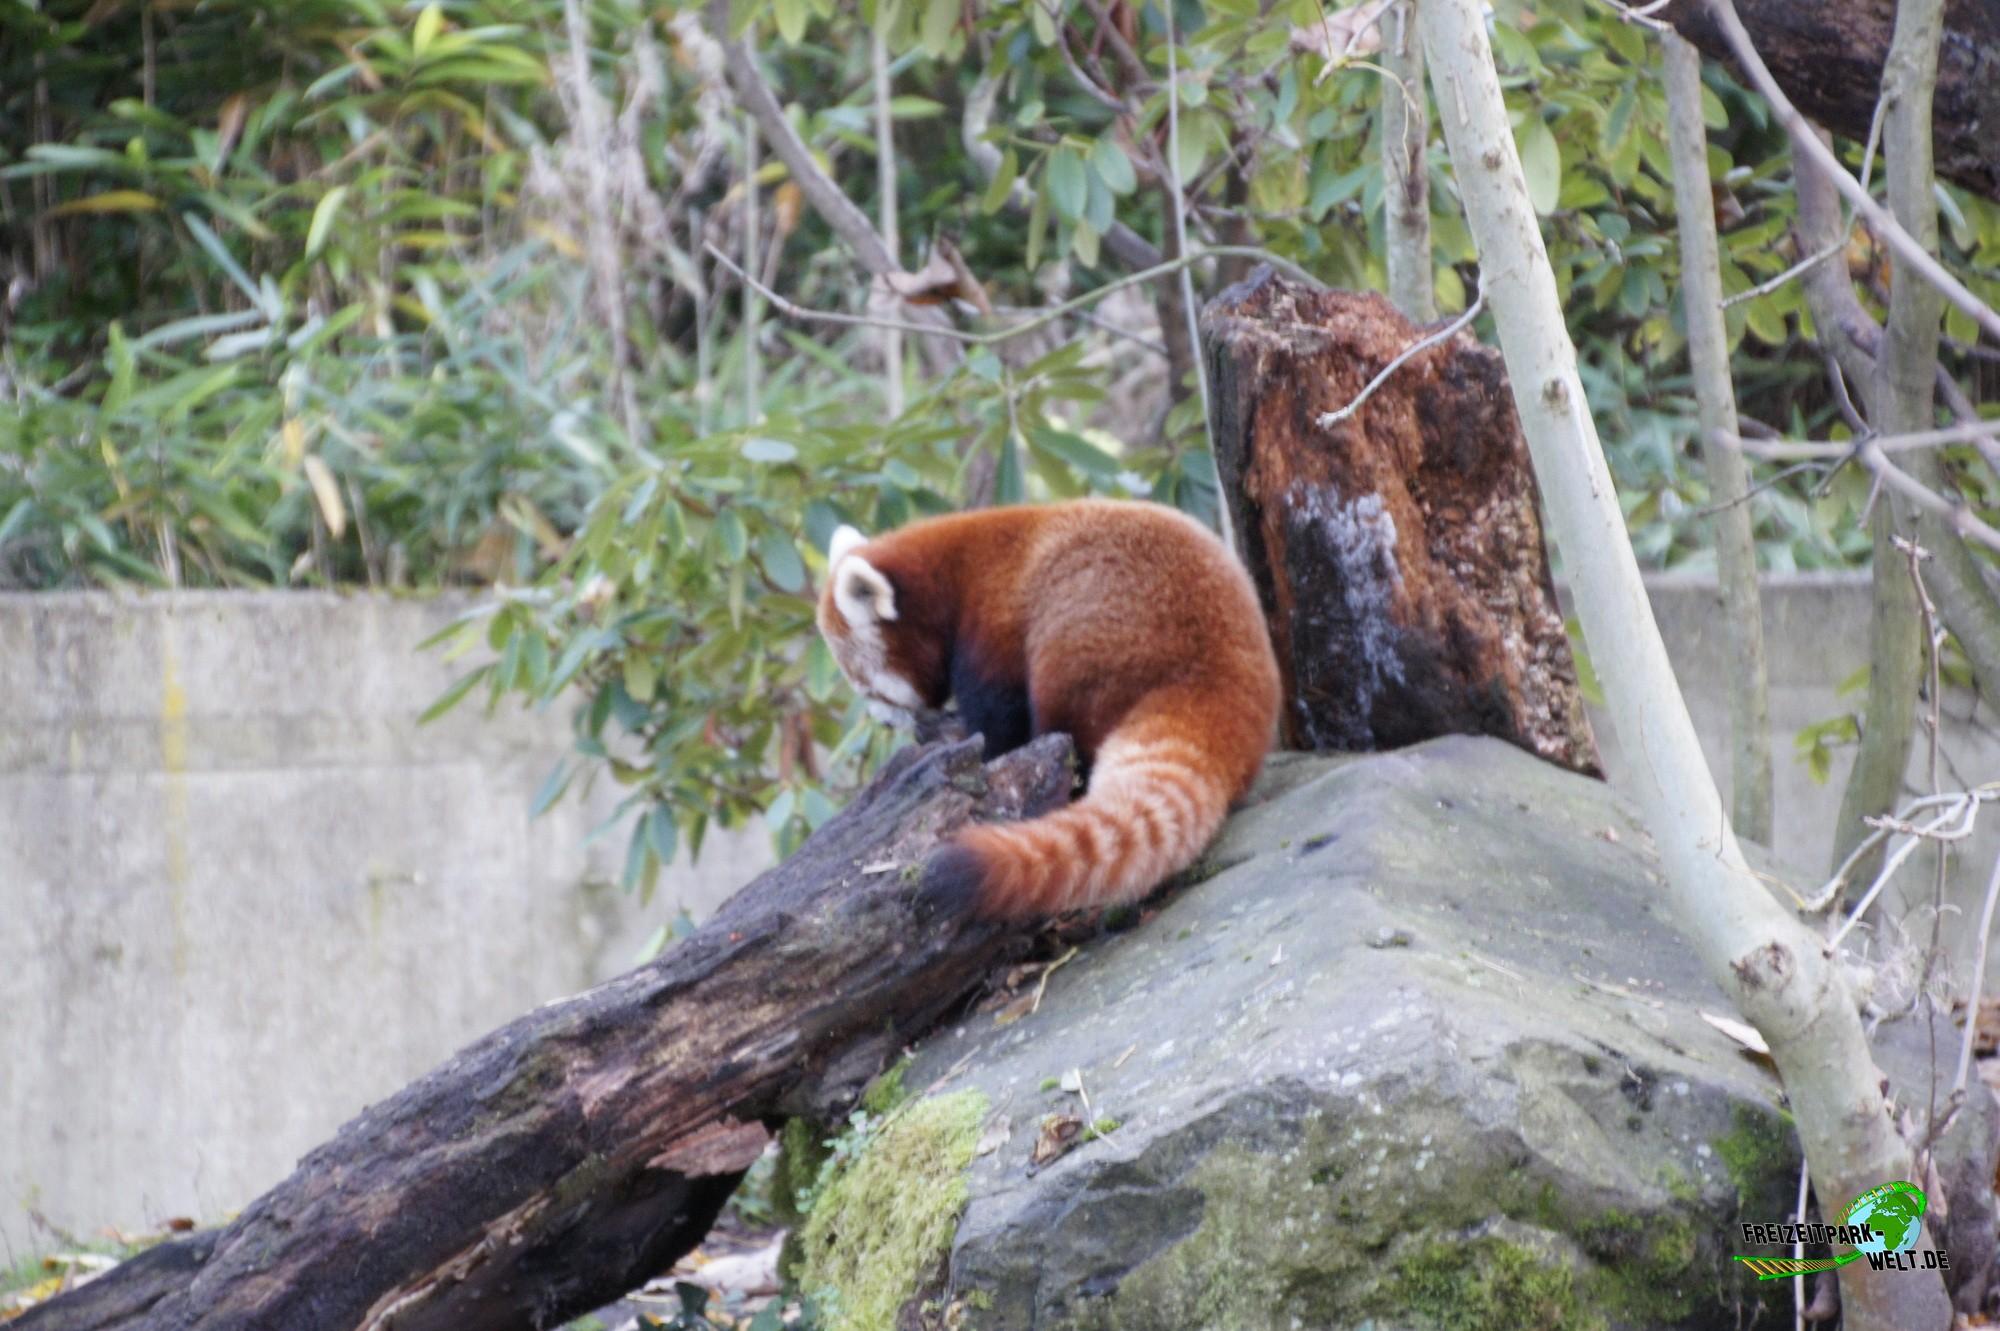 kleiner panda zoo dortmund freizeitpark. Black Bedroom Furniture Sets. Home Design Ideas